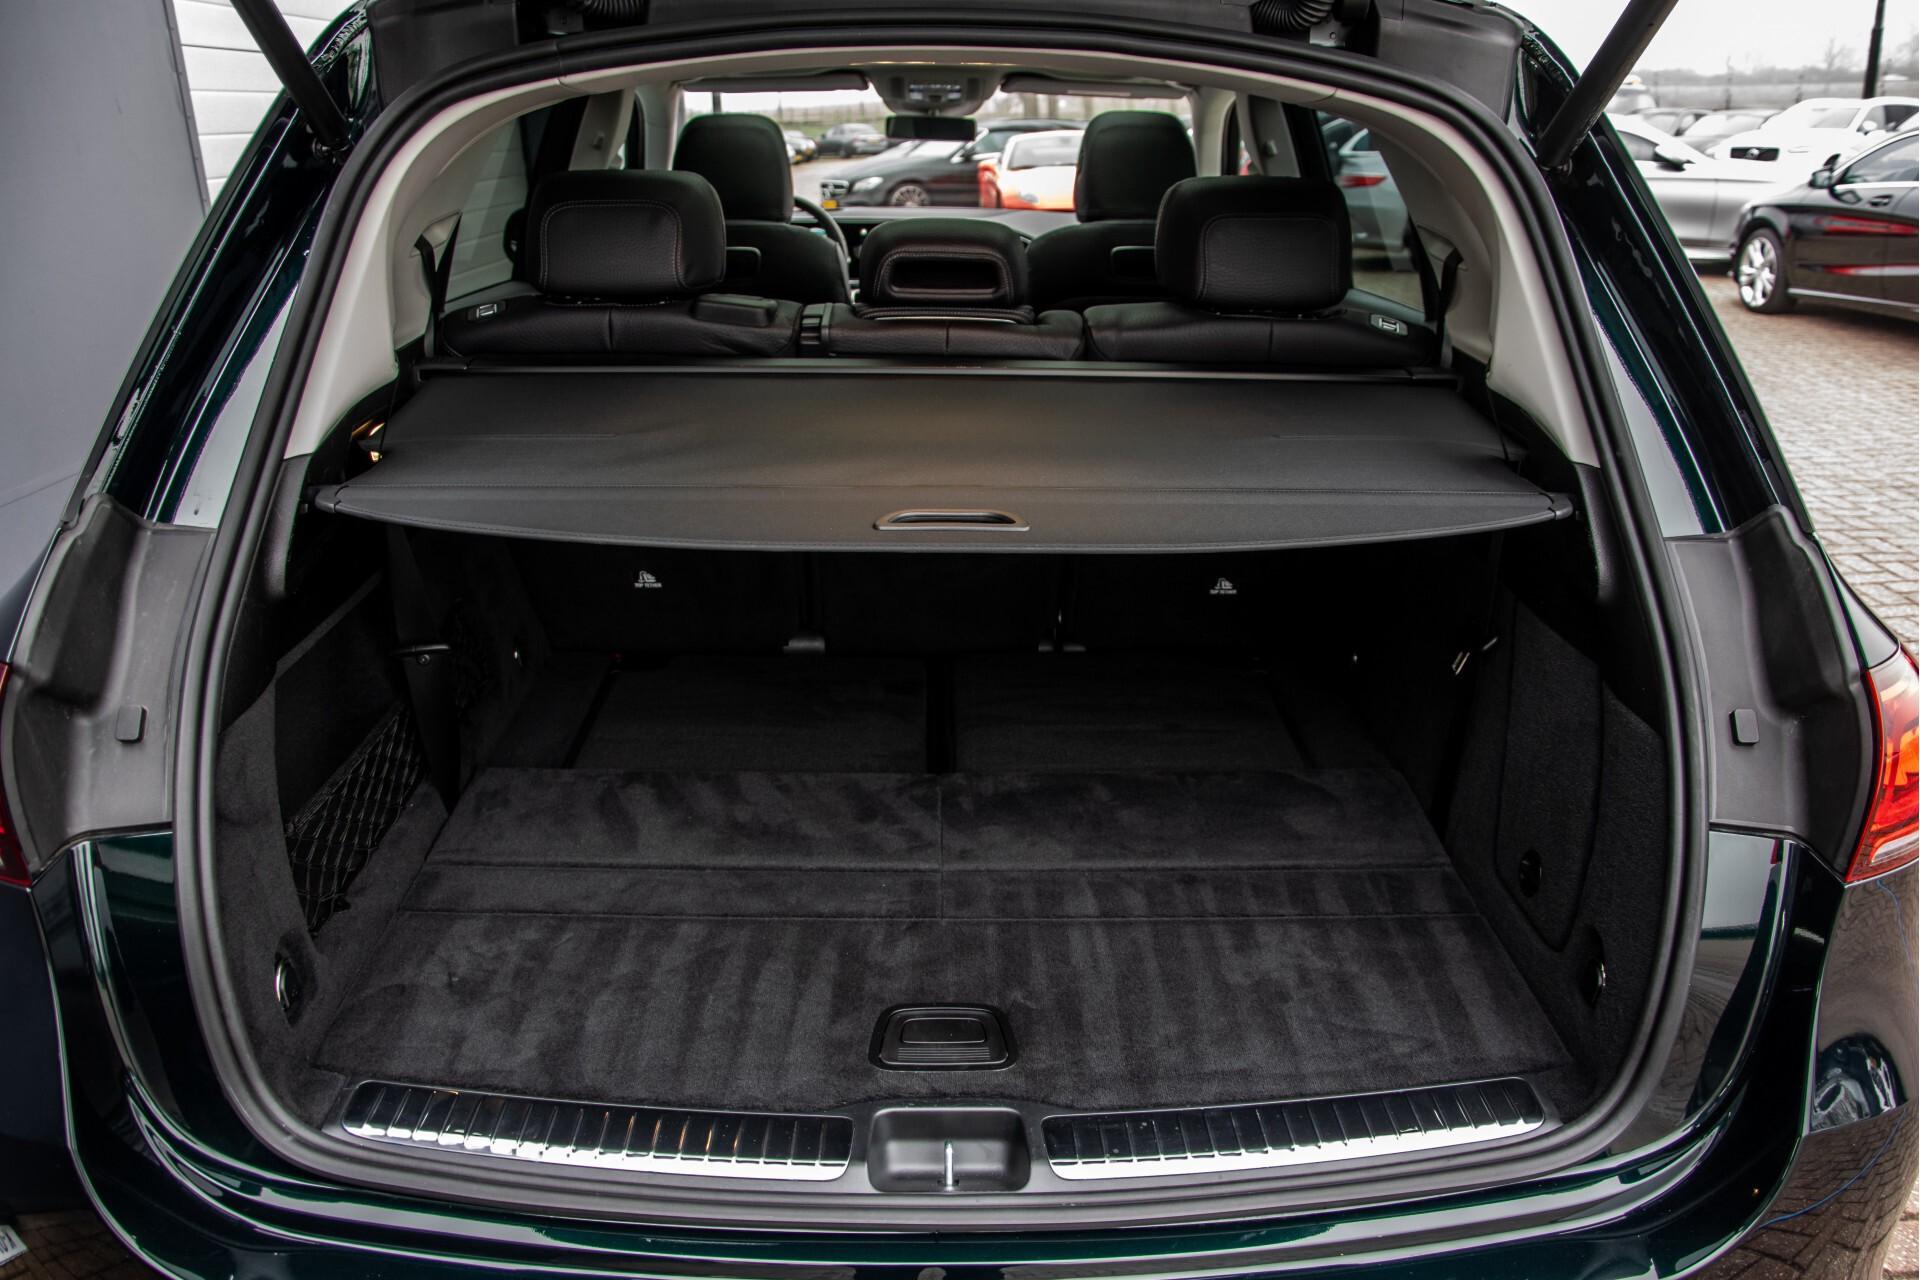 Mercedes-Benz GLE 450 4-M 7-Persoons AMG Massage/Rij-assist/Keyless/TV/360/Night/Trekhaak Aut9 Foto 70